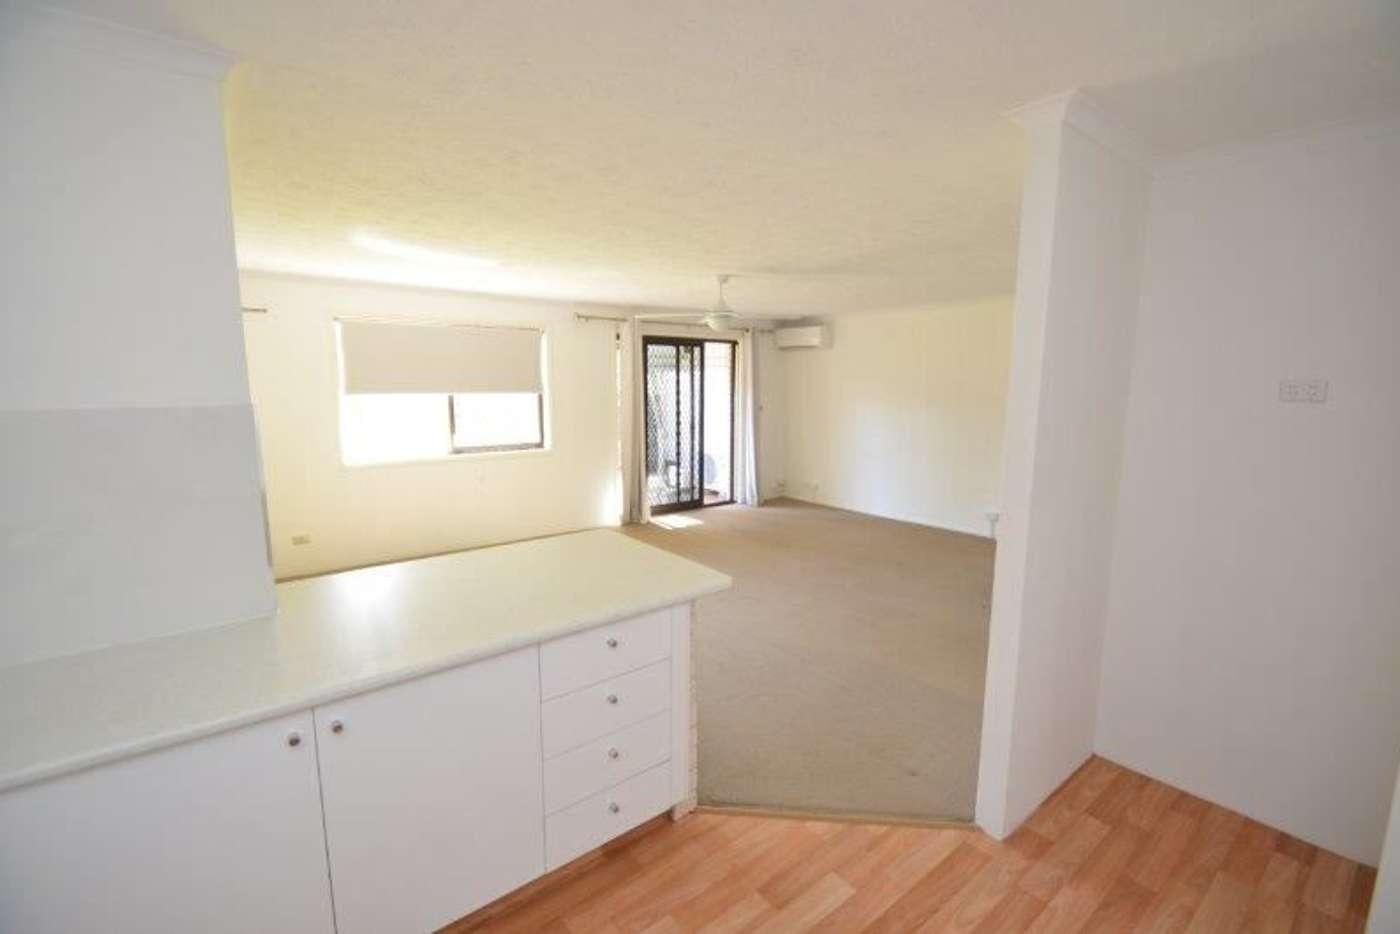 Seventh view of Homely unit listing, 1/14 Brett Avenue, Labrador QLD 4215